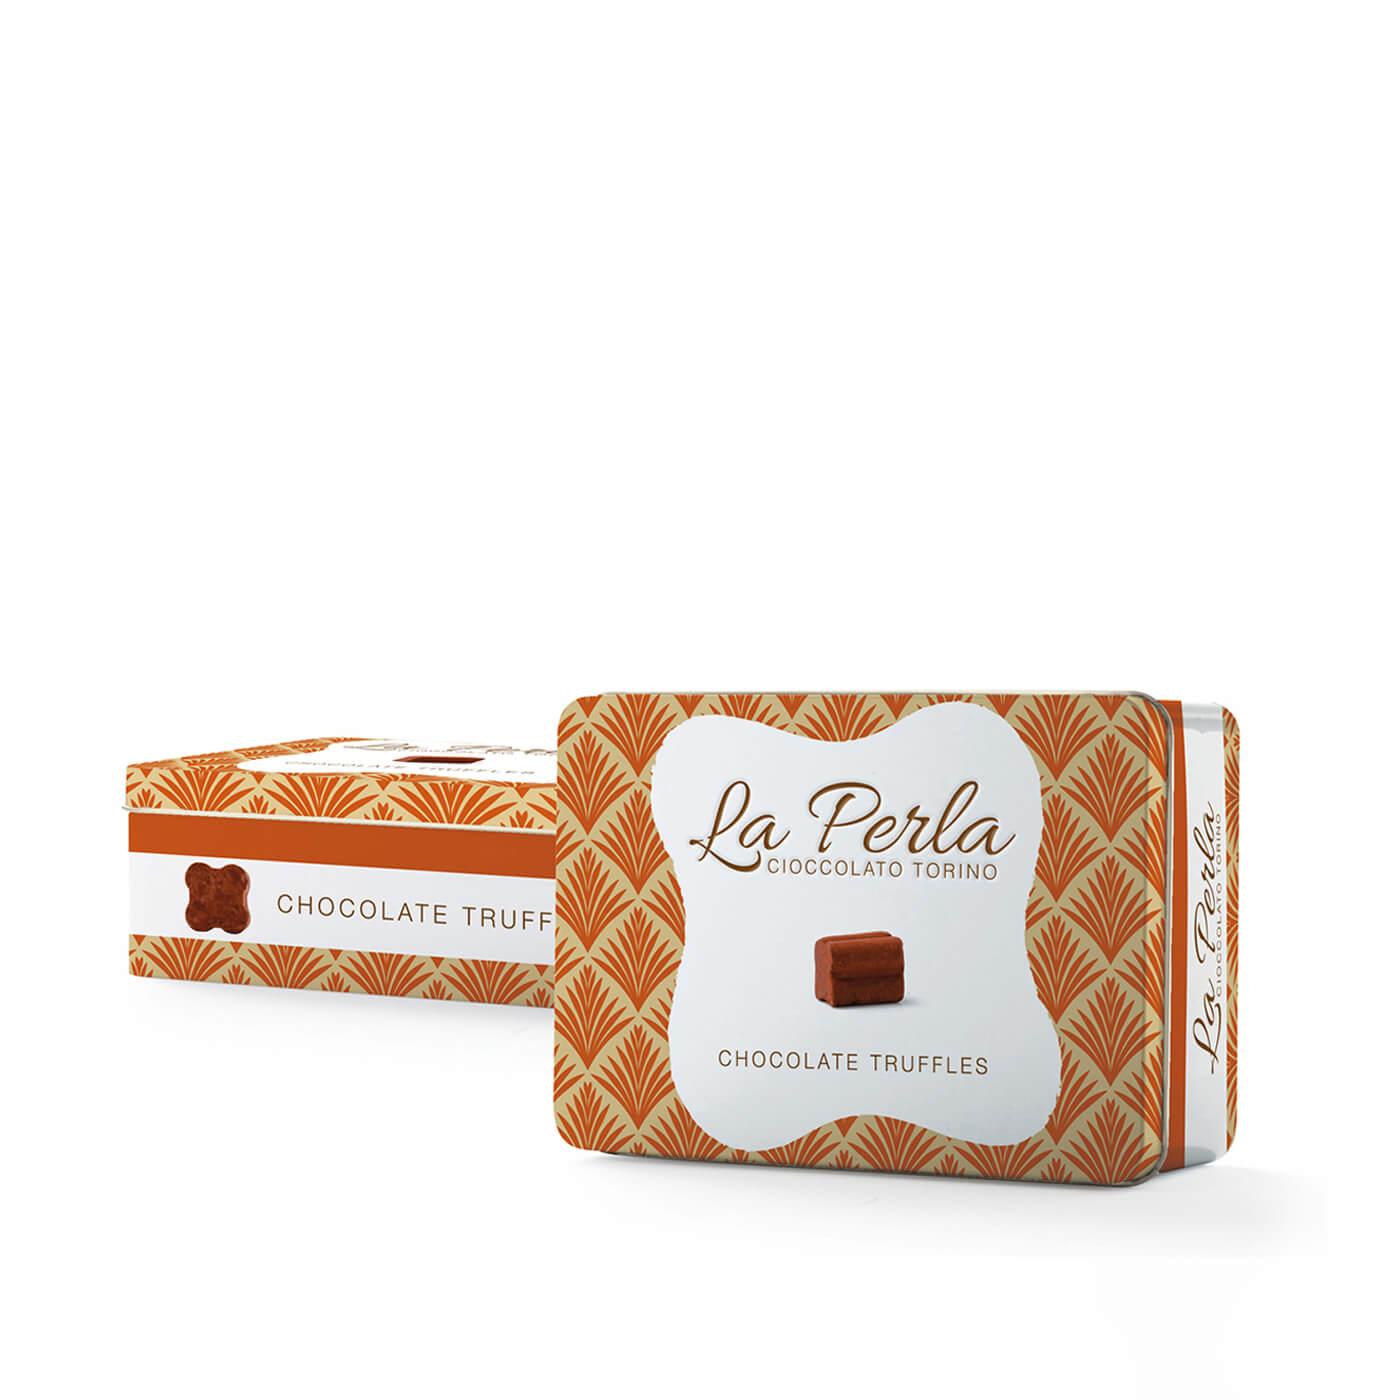 tartufi-cioccolato-la-perla-di-torino-91